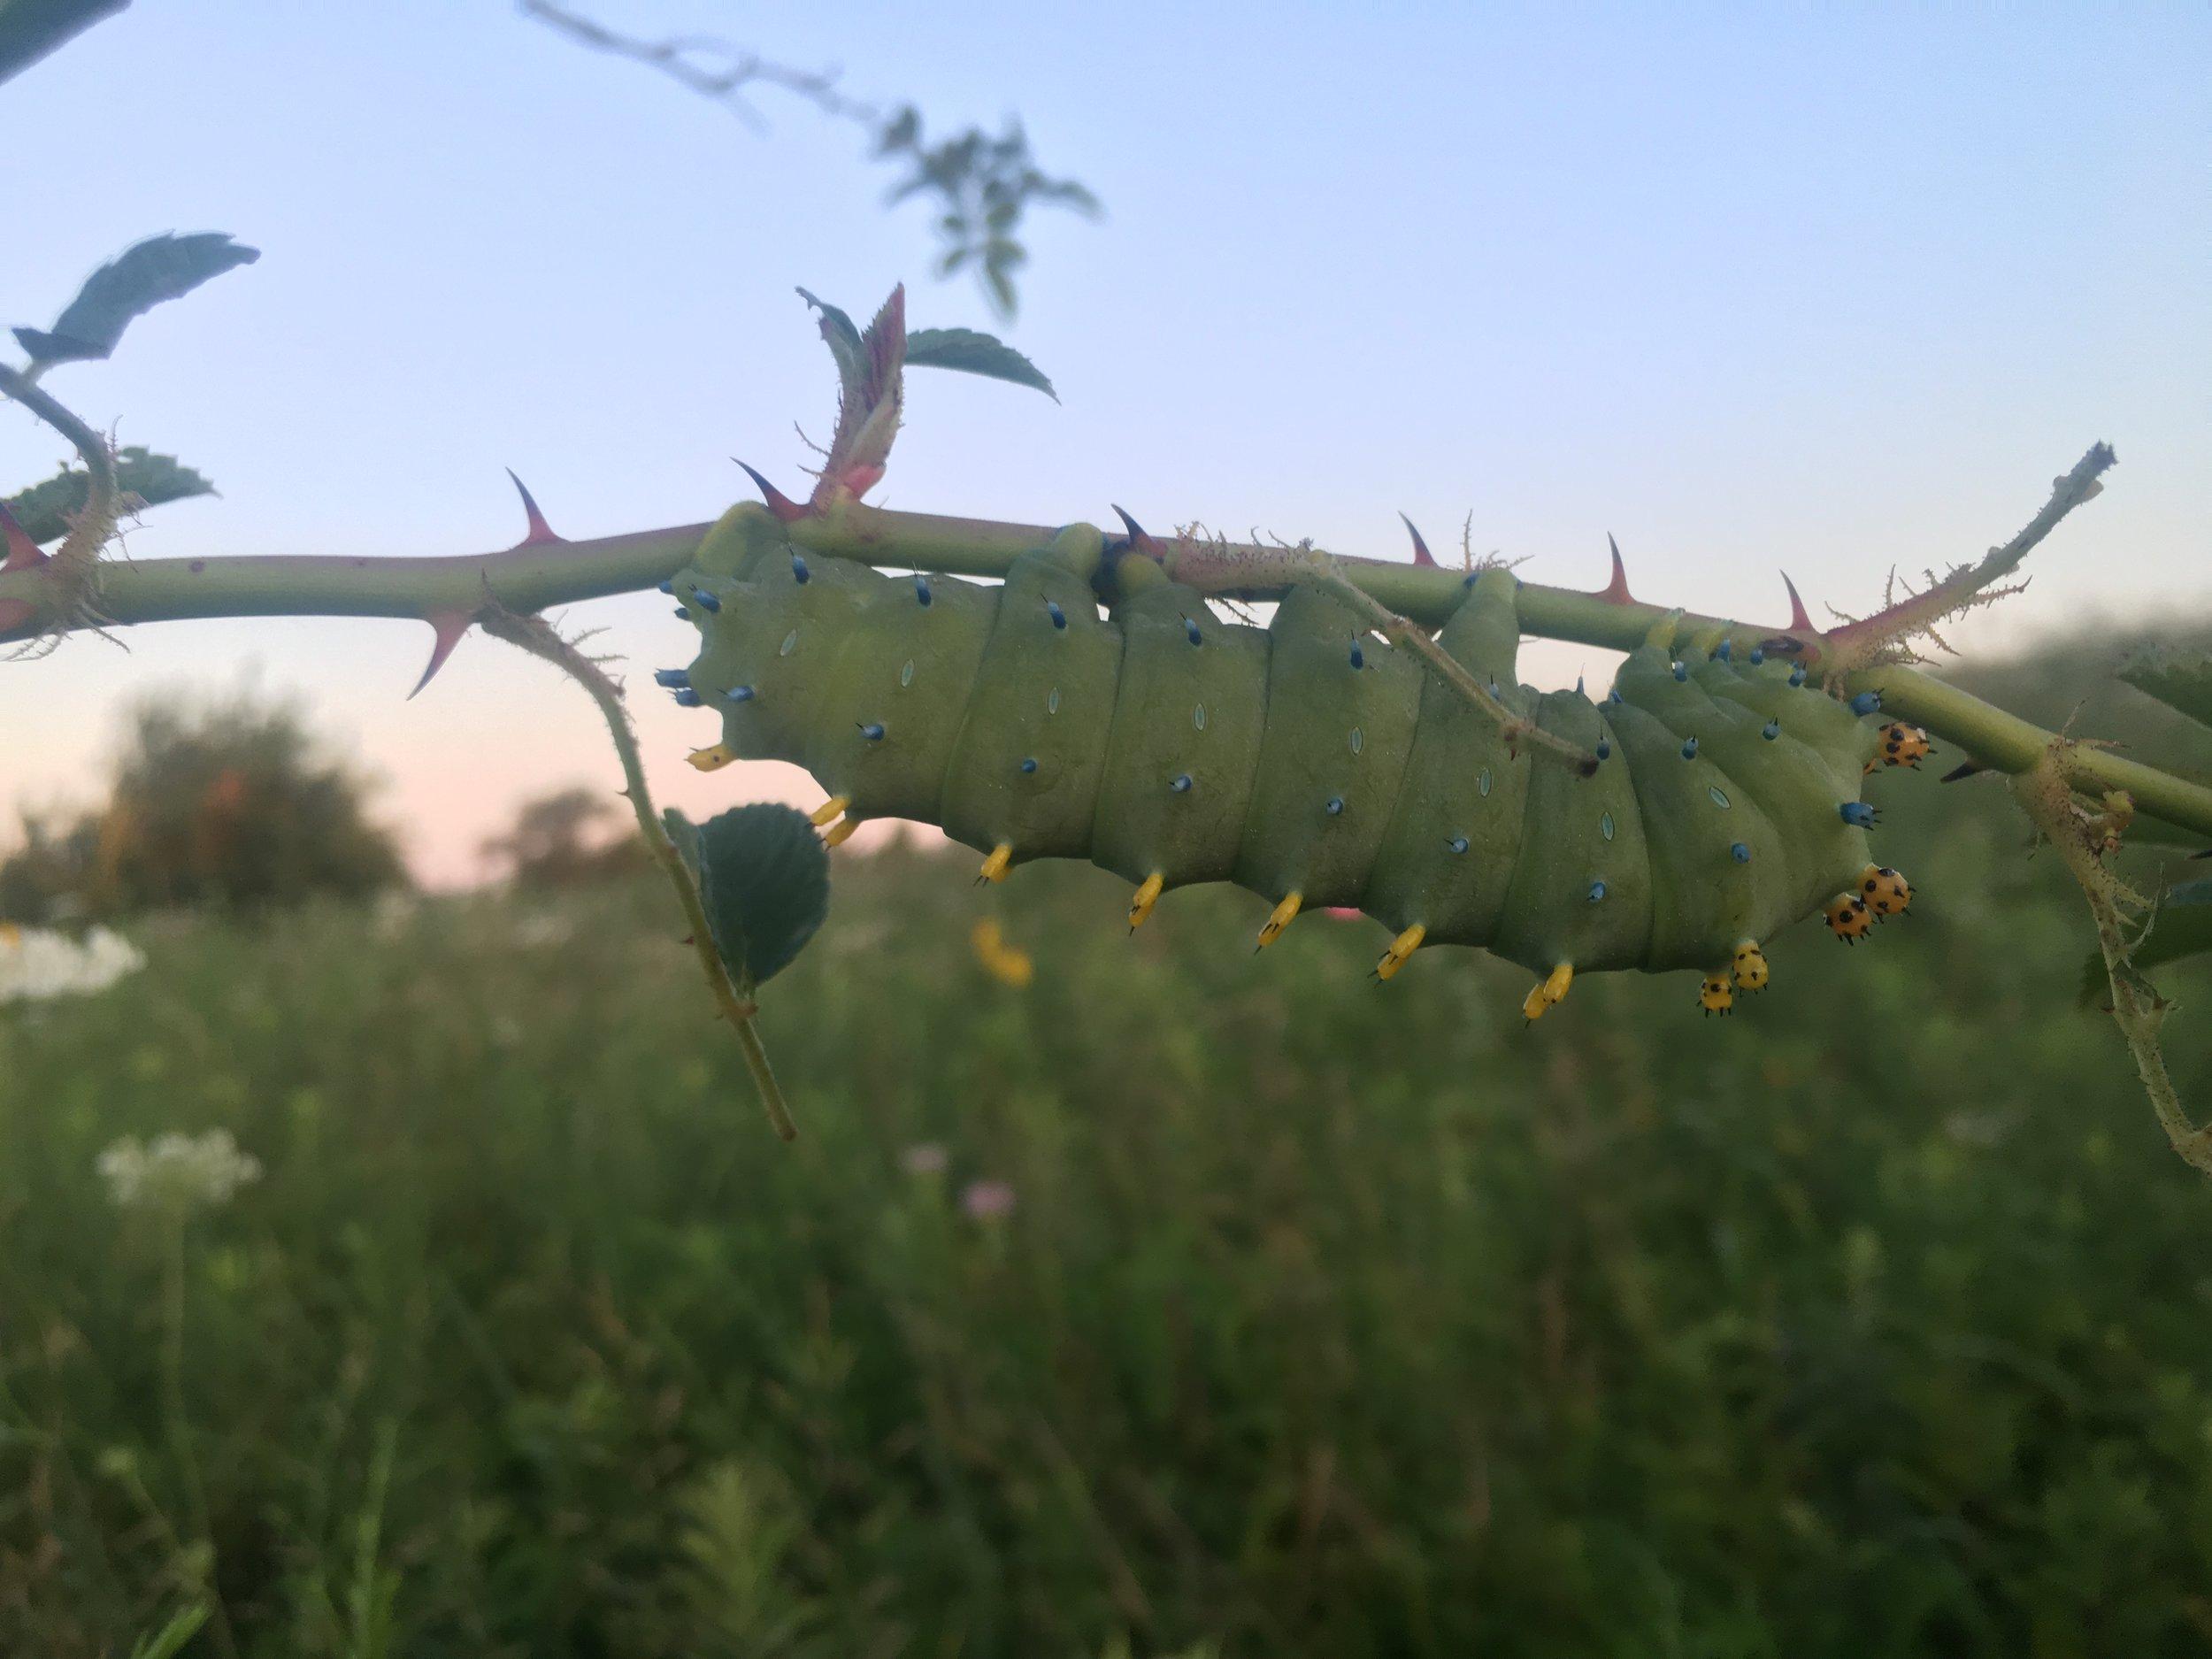 JJC_large moth caterpillar_GIL_2016.JPG